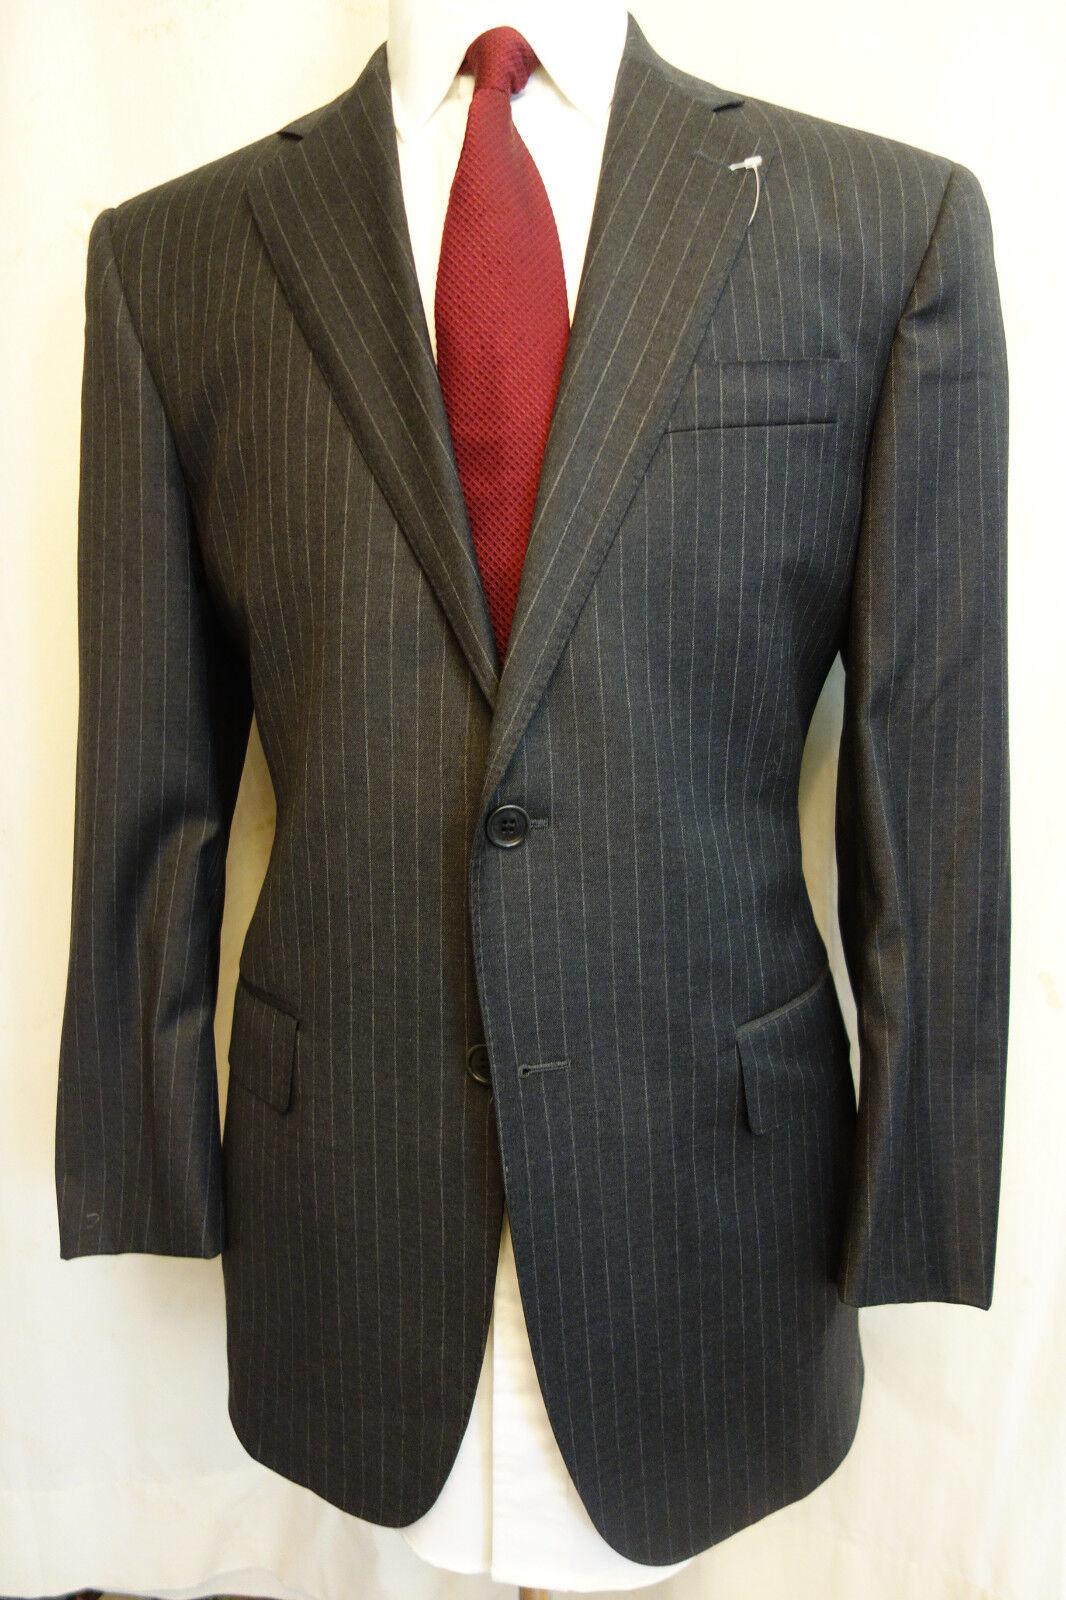 NWOT Brooks Brothers Custom TailoROT grau Pinstripe Wool Suit 40R